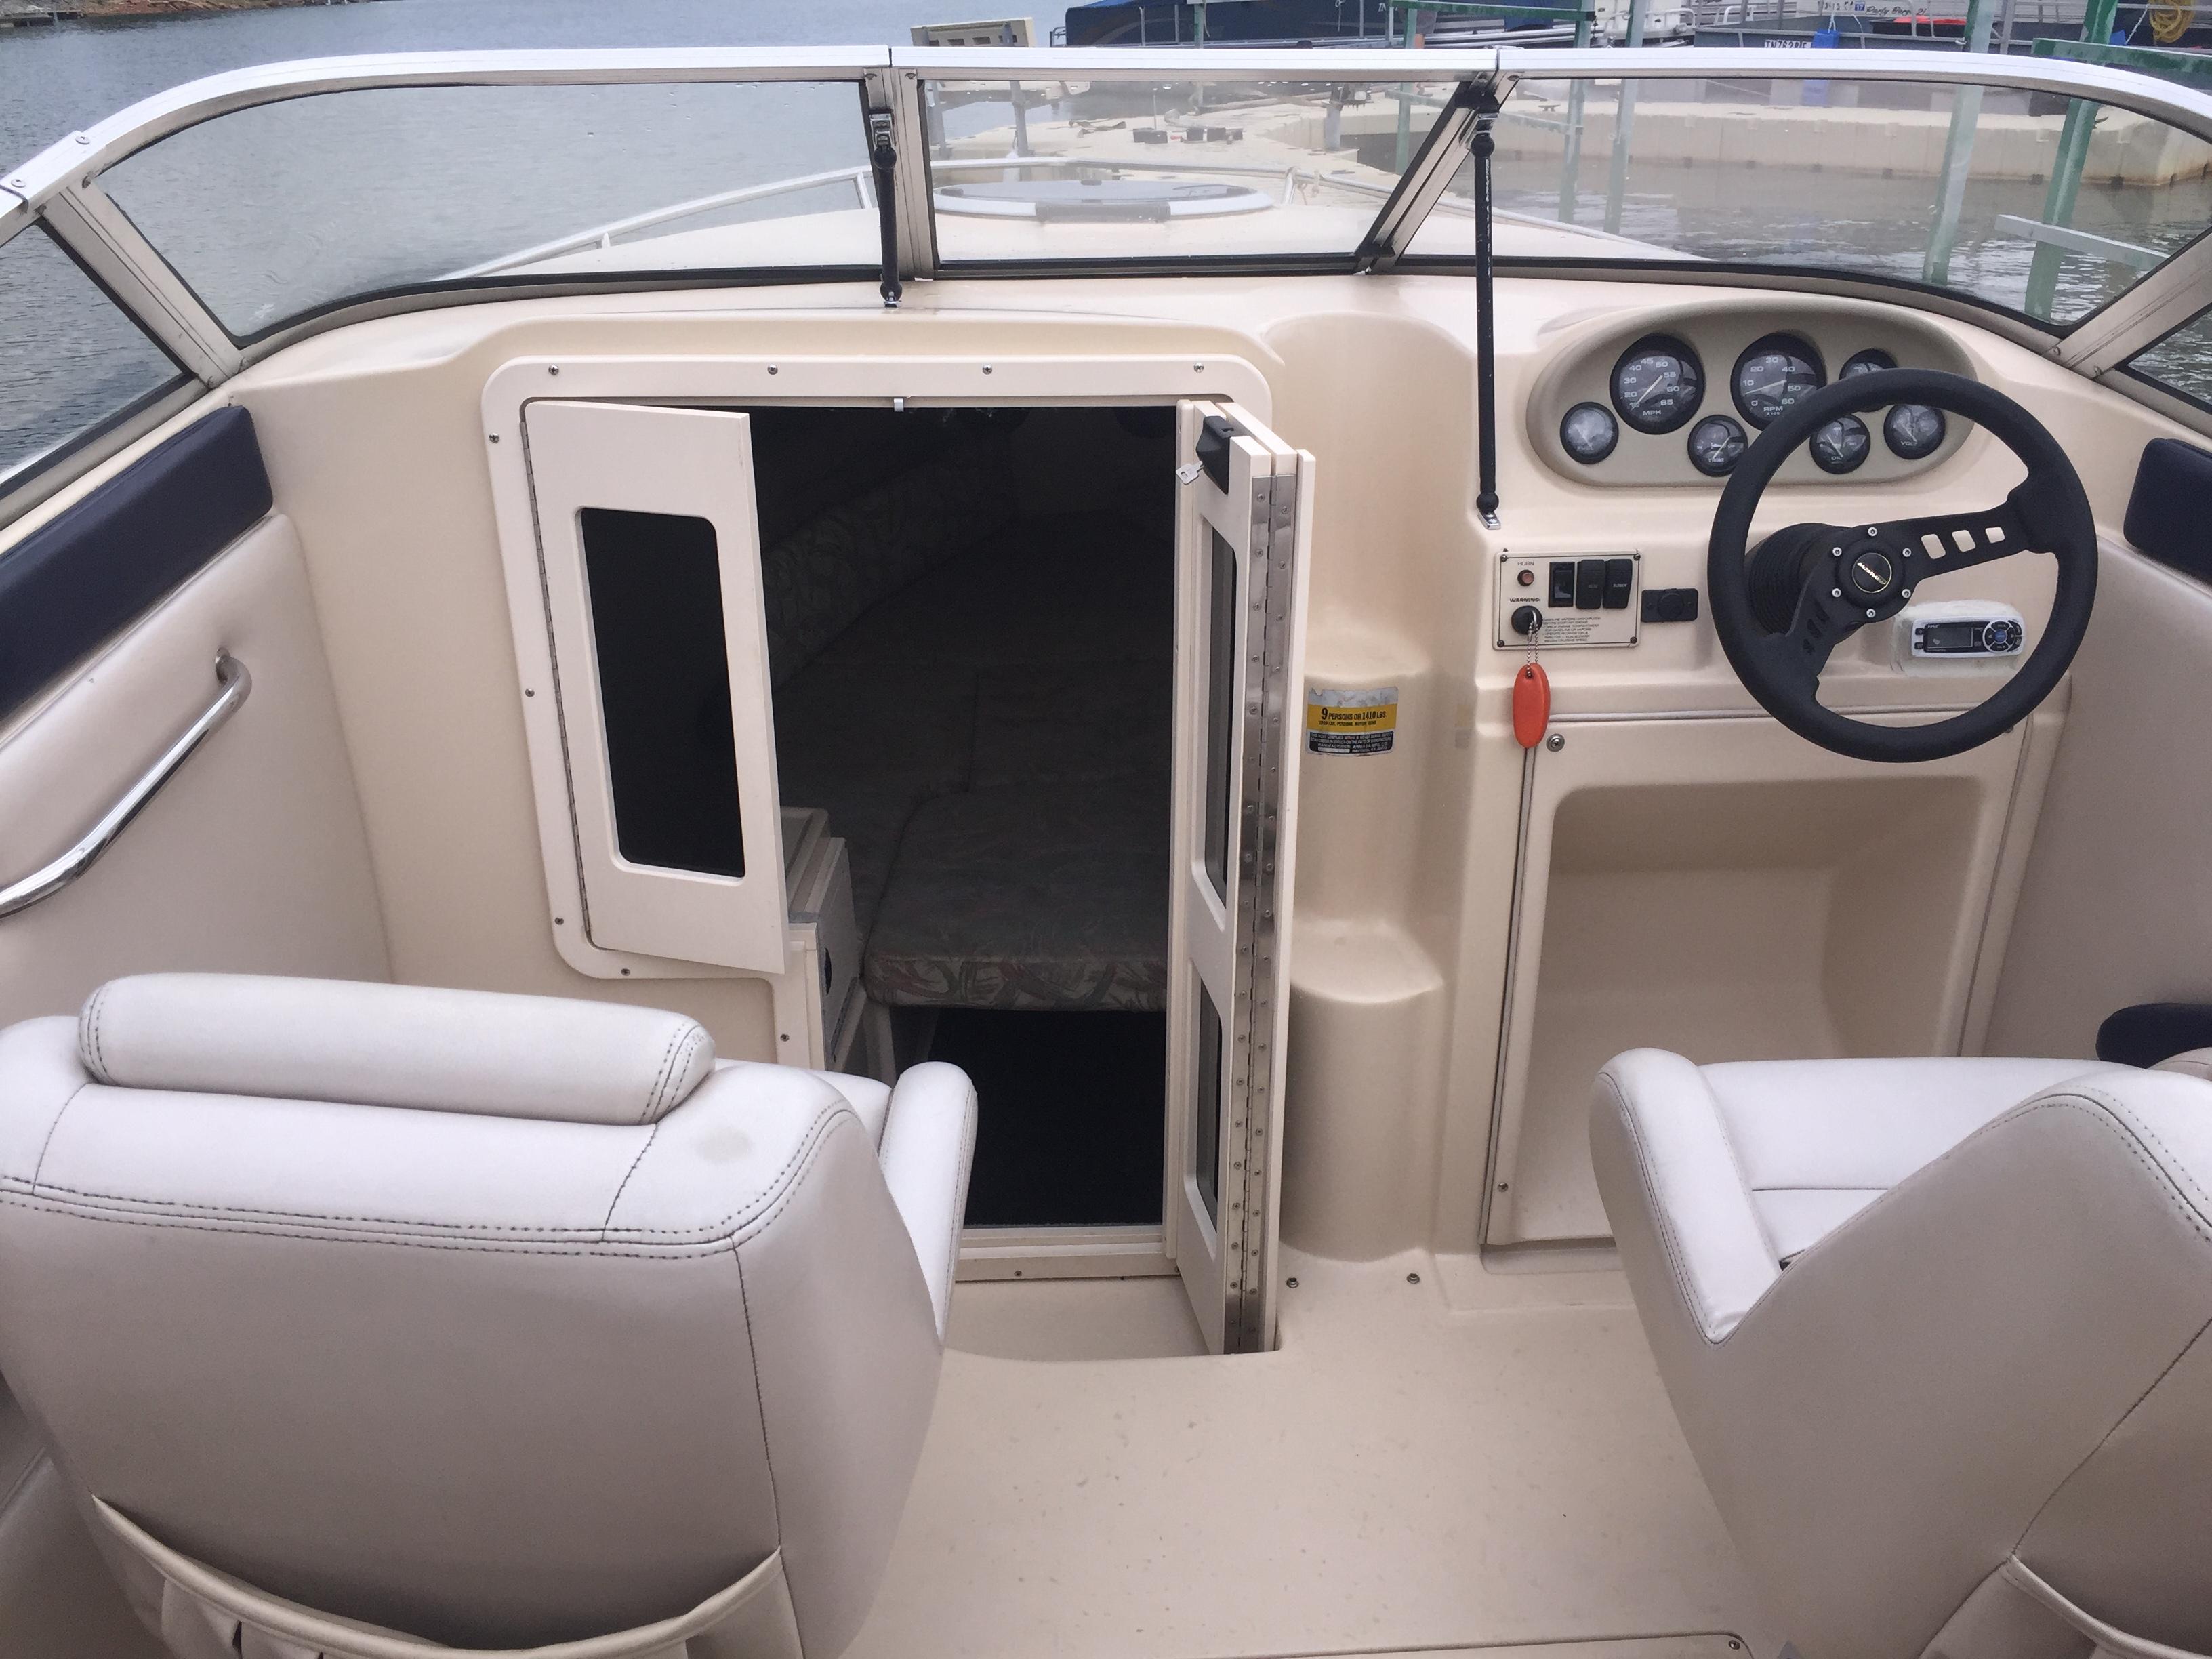 vehicle dsc cruiser cabin service boats cabins feadship boat tourboat devea classic